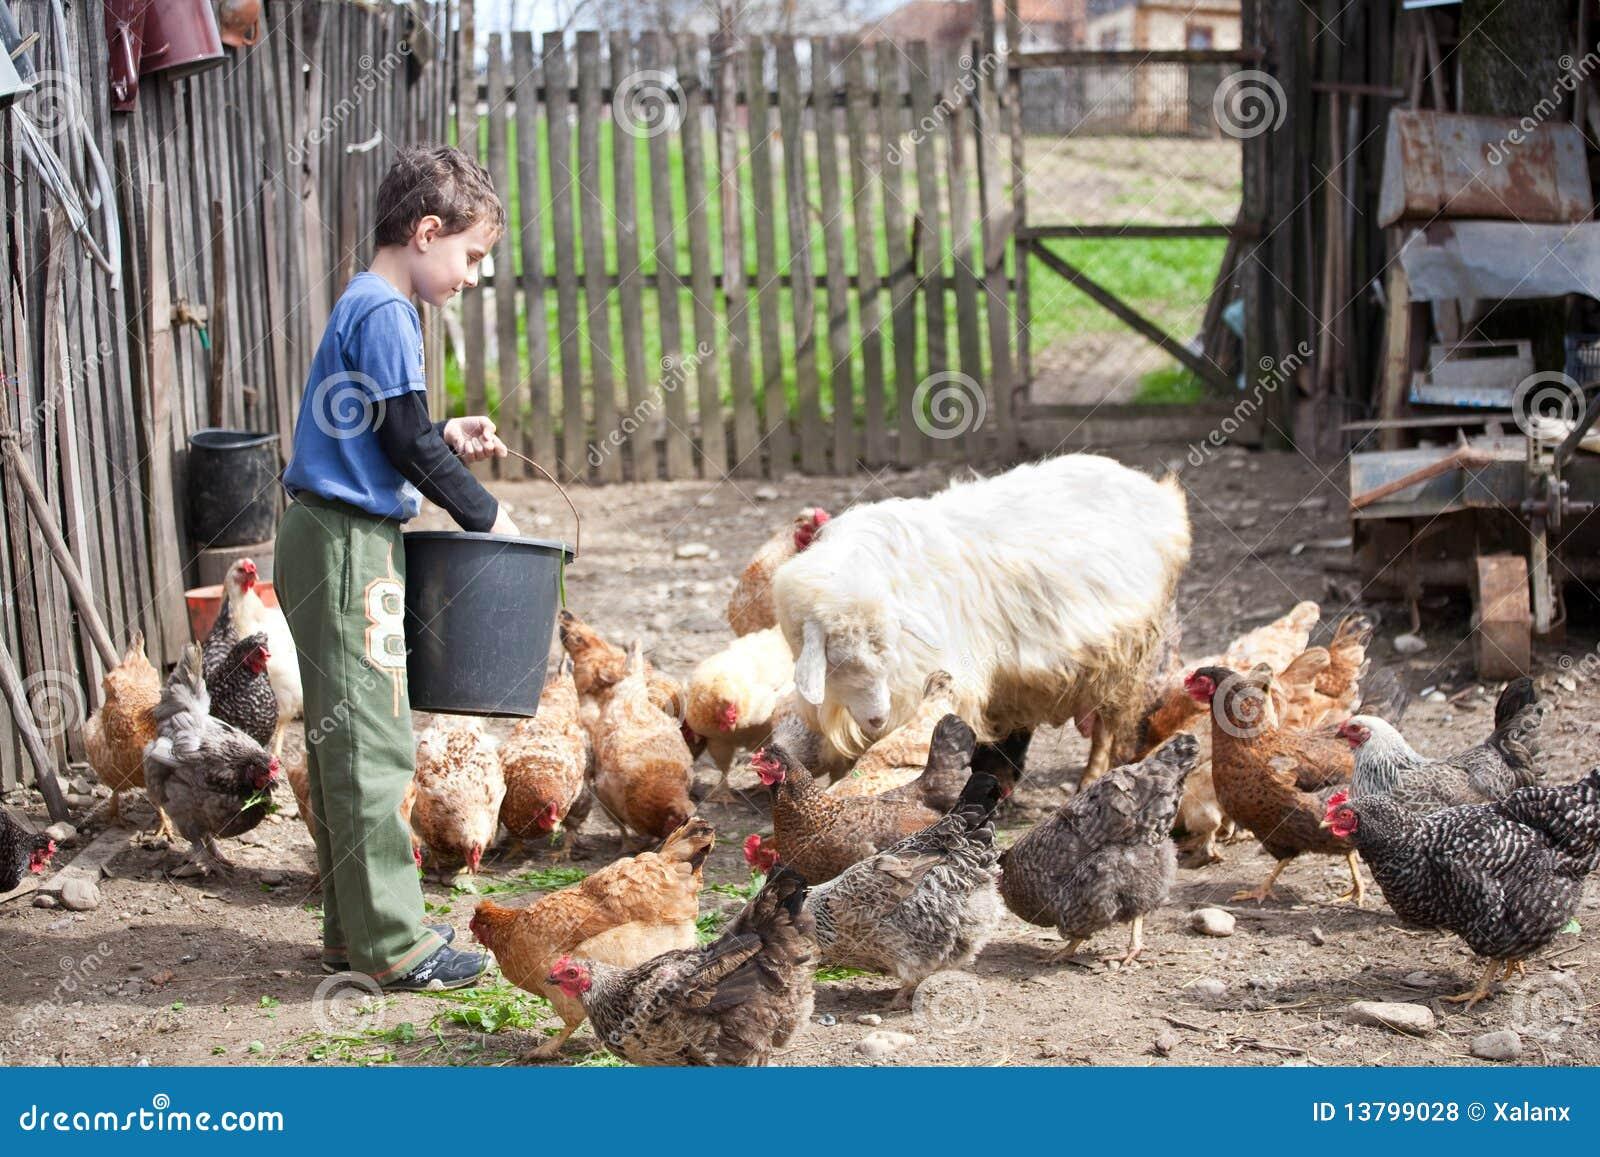 Country Boy Feeding The Animals Royalty Free Stock Photos - Image ...